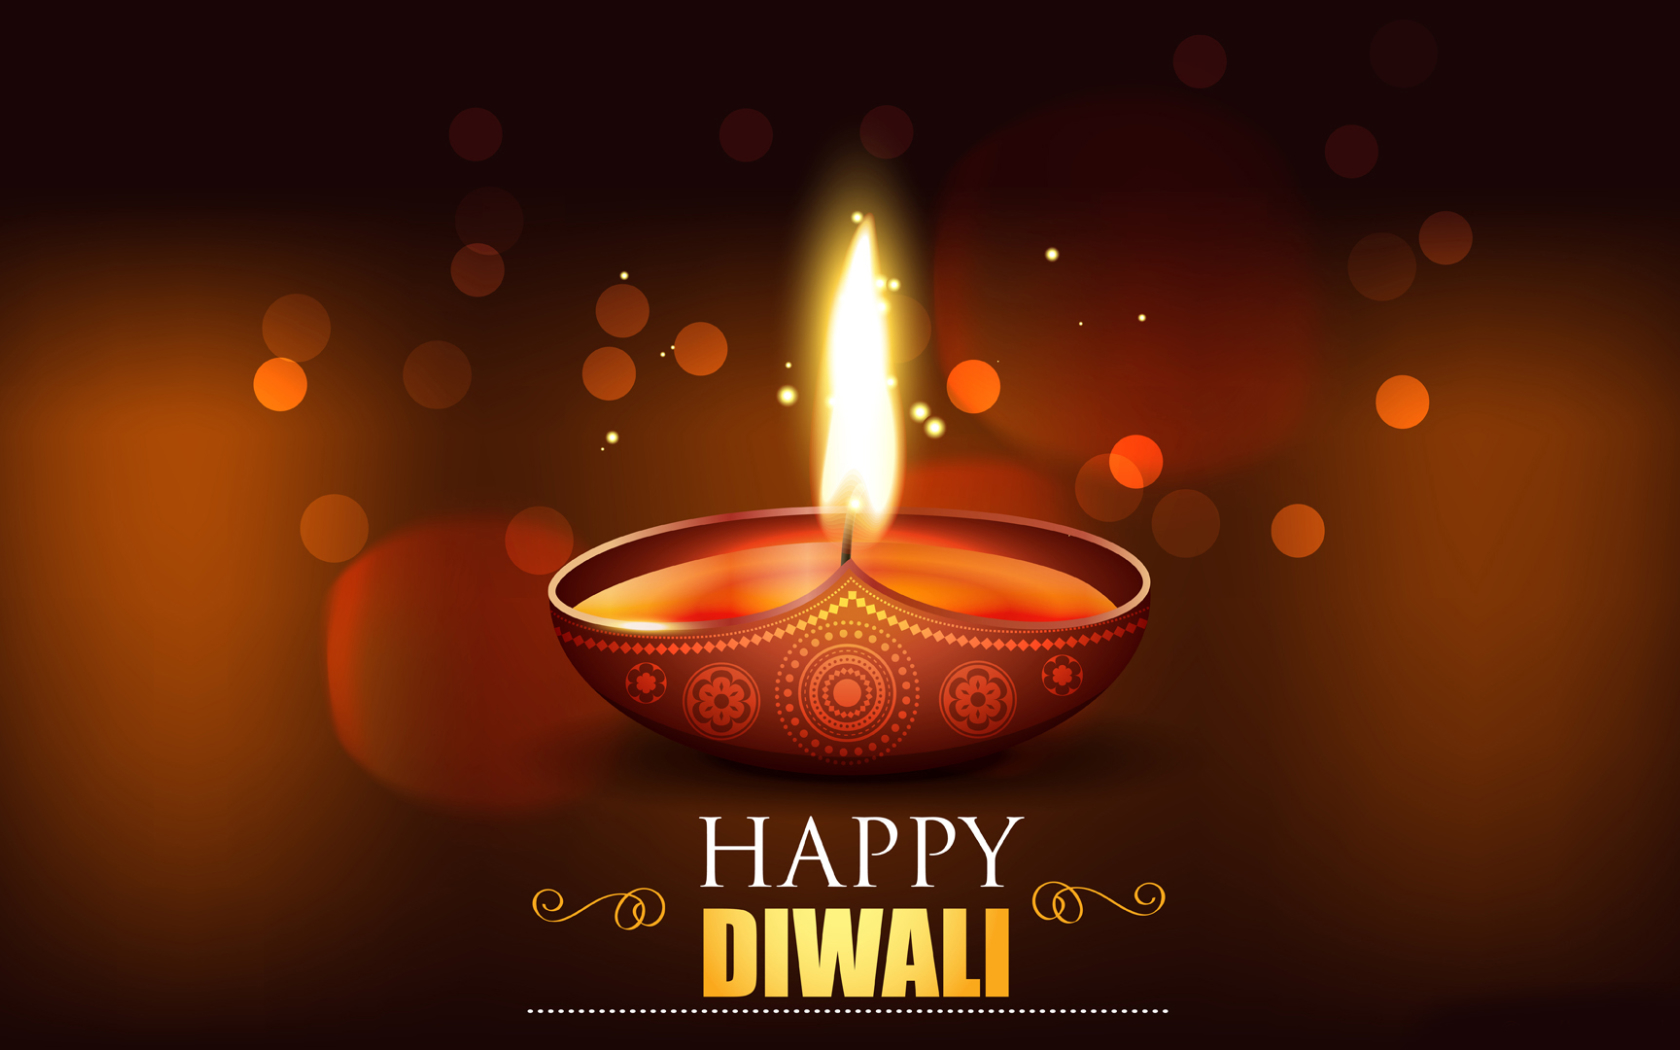 Happy Diwali 2020 Wallpaper in 1680x1050 Resolution